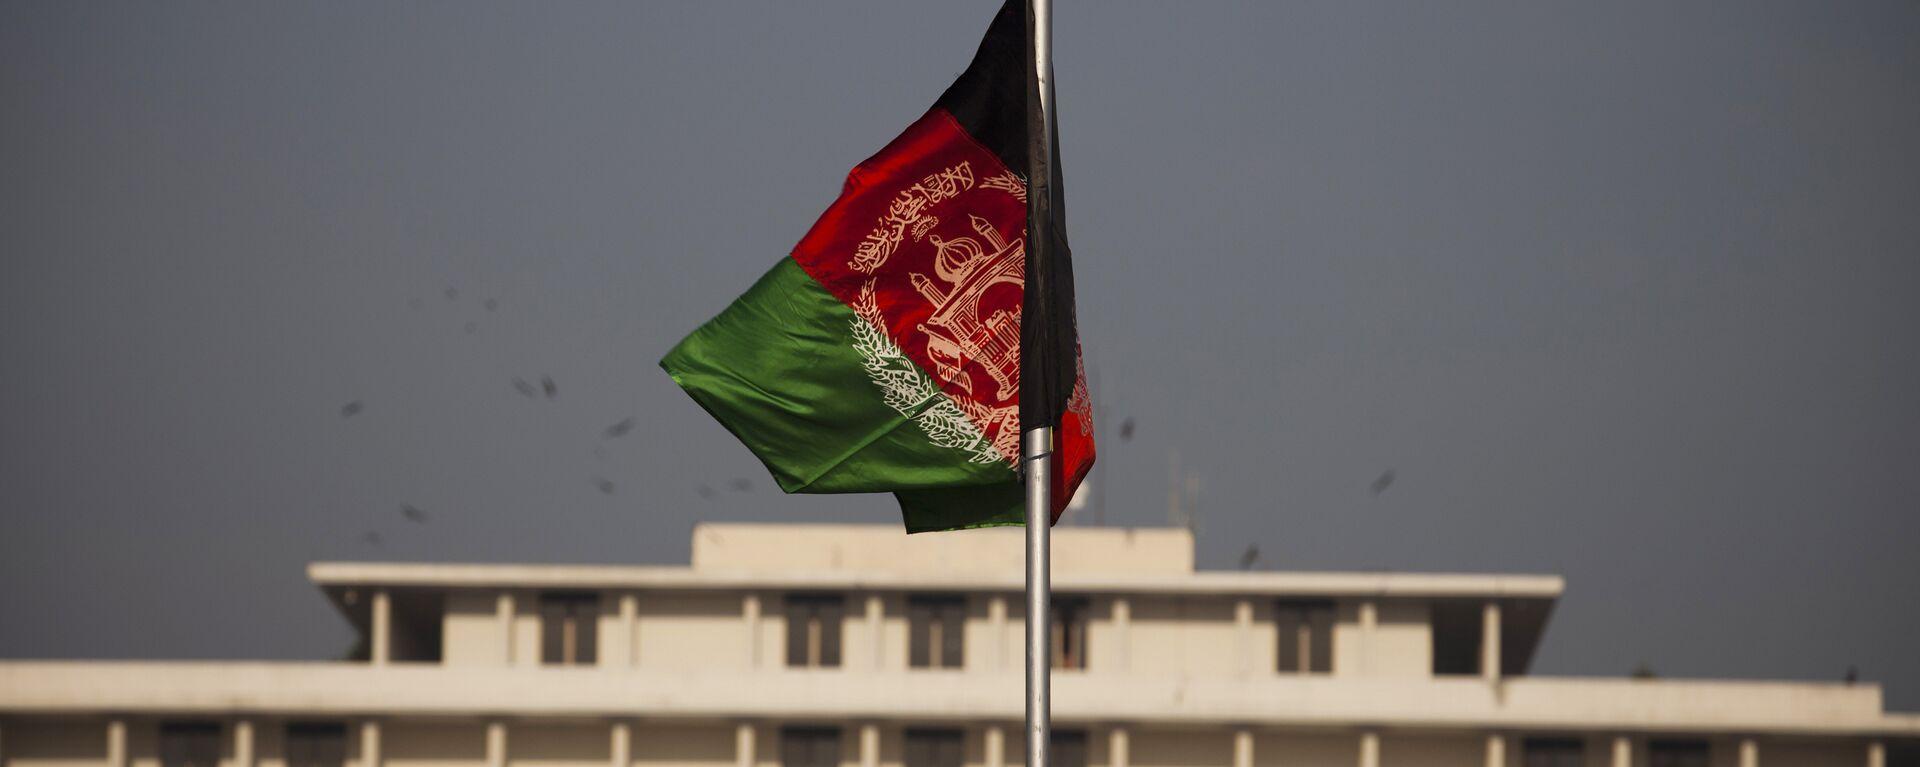 Bandera de Afganistán - Sputnik Mundo, 1920, 31.08.2021